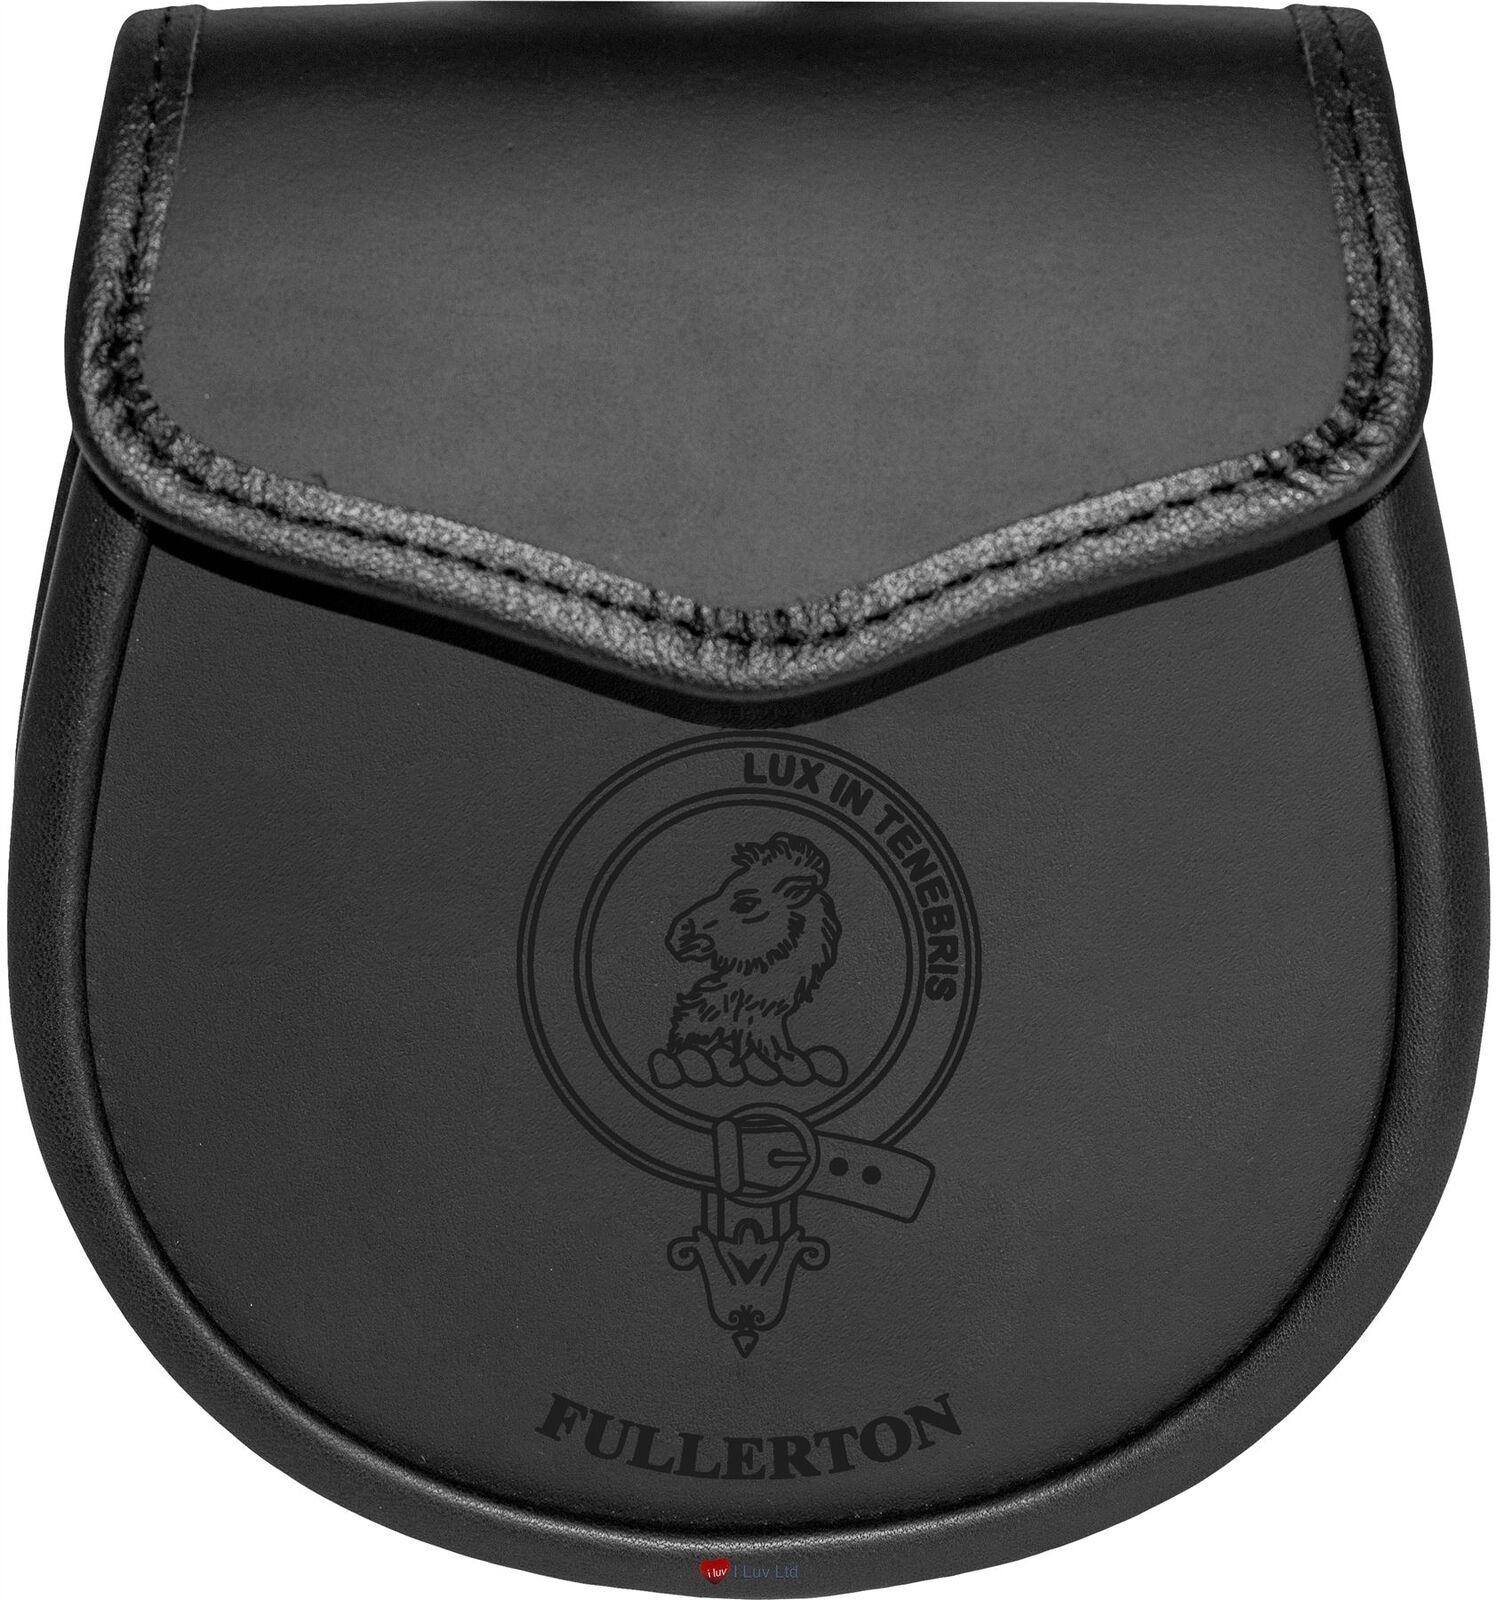 Fullerton Leather Day Sporran Scottish Clan Crest